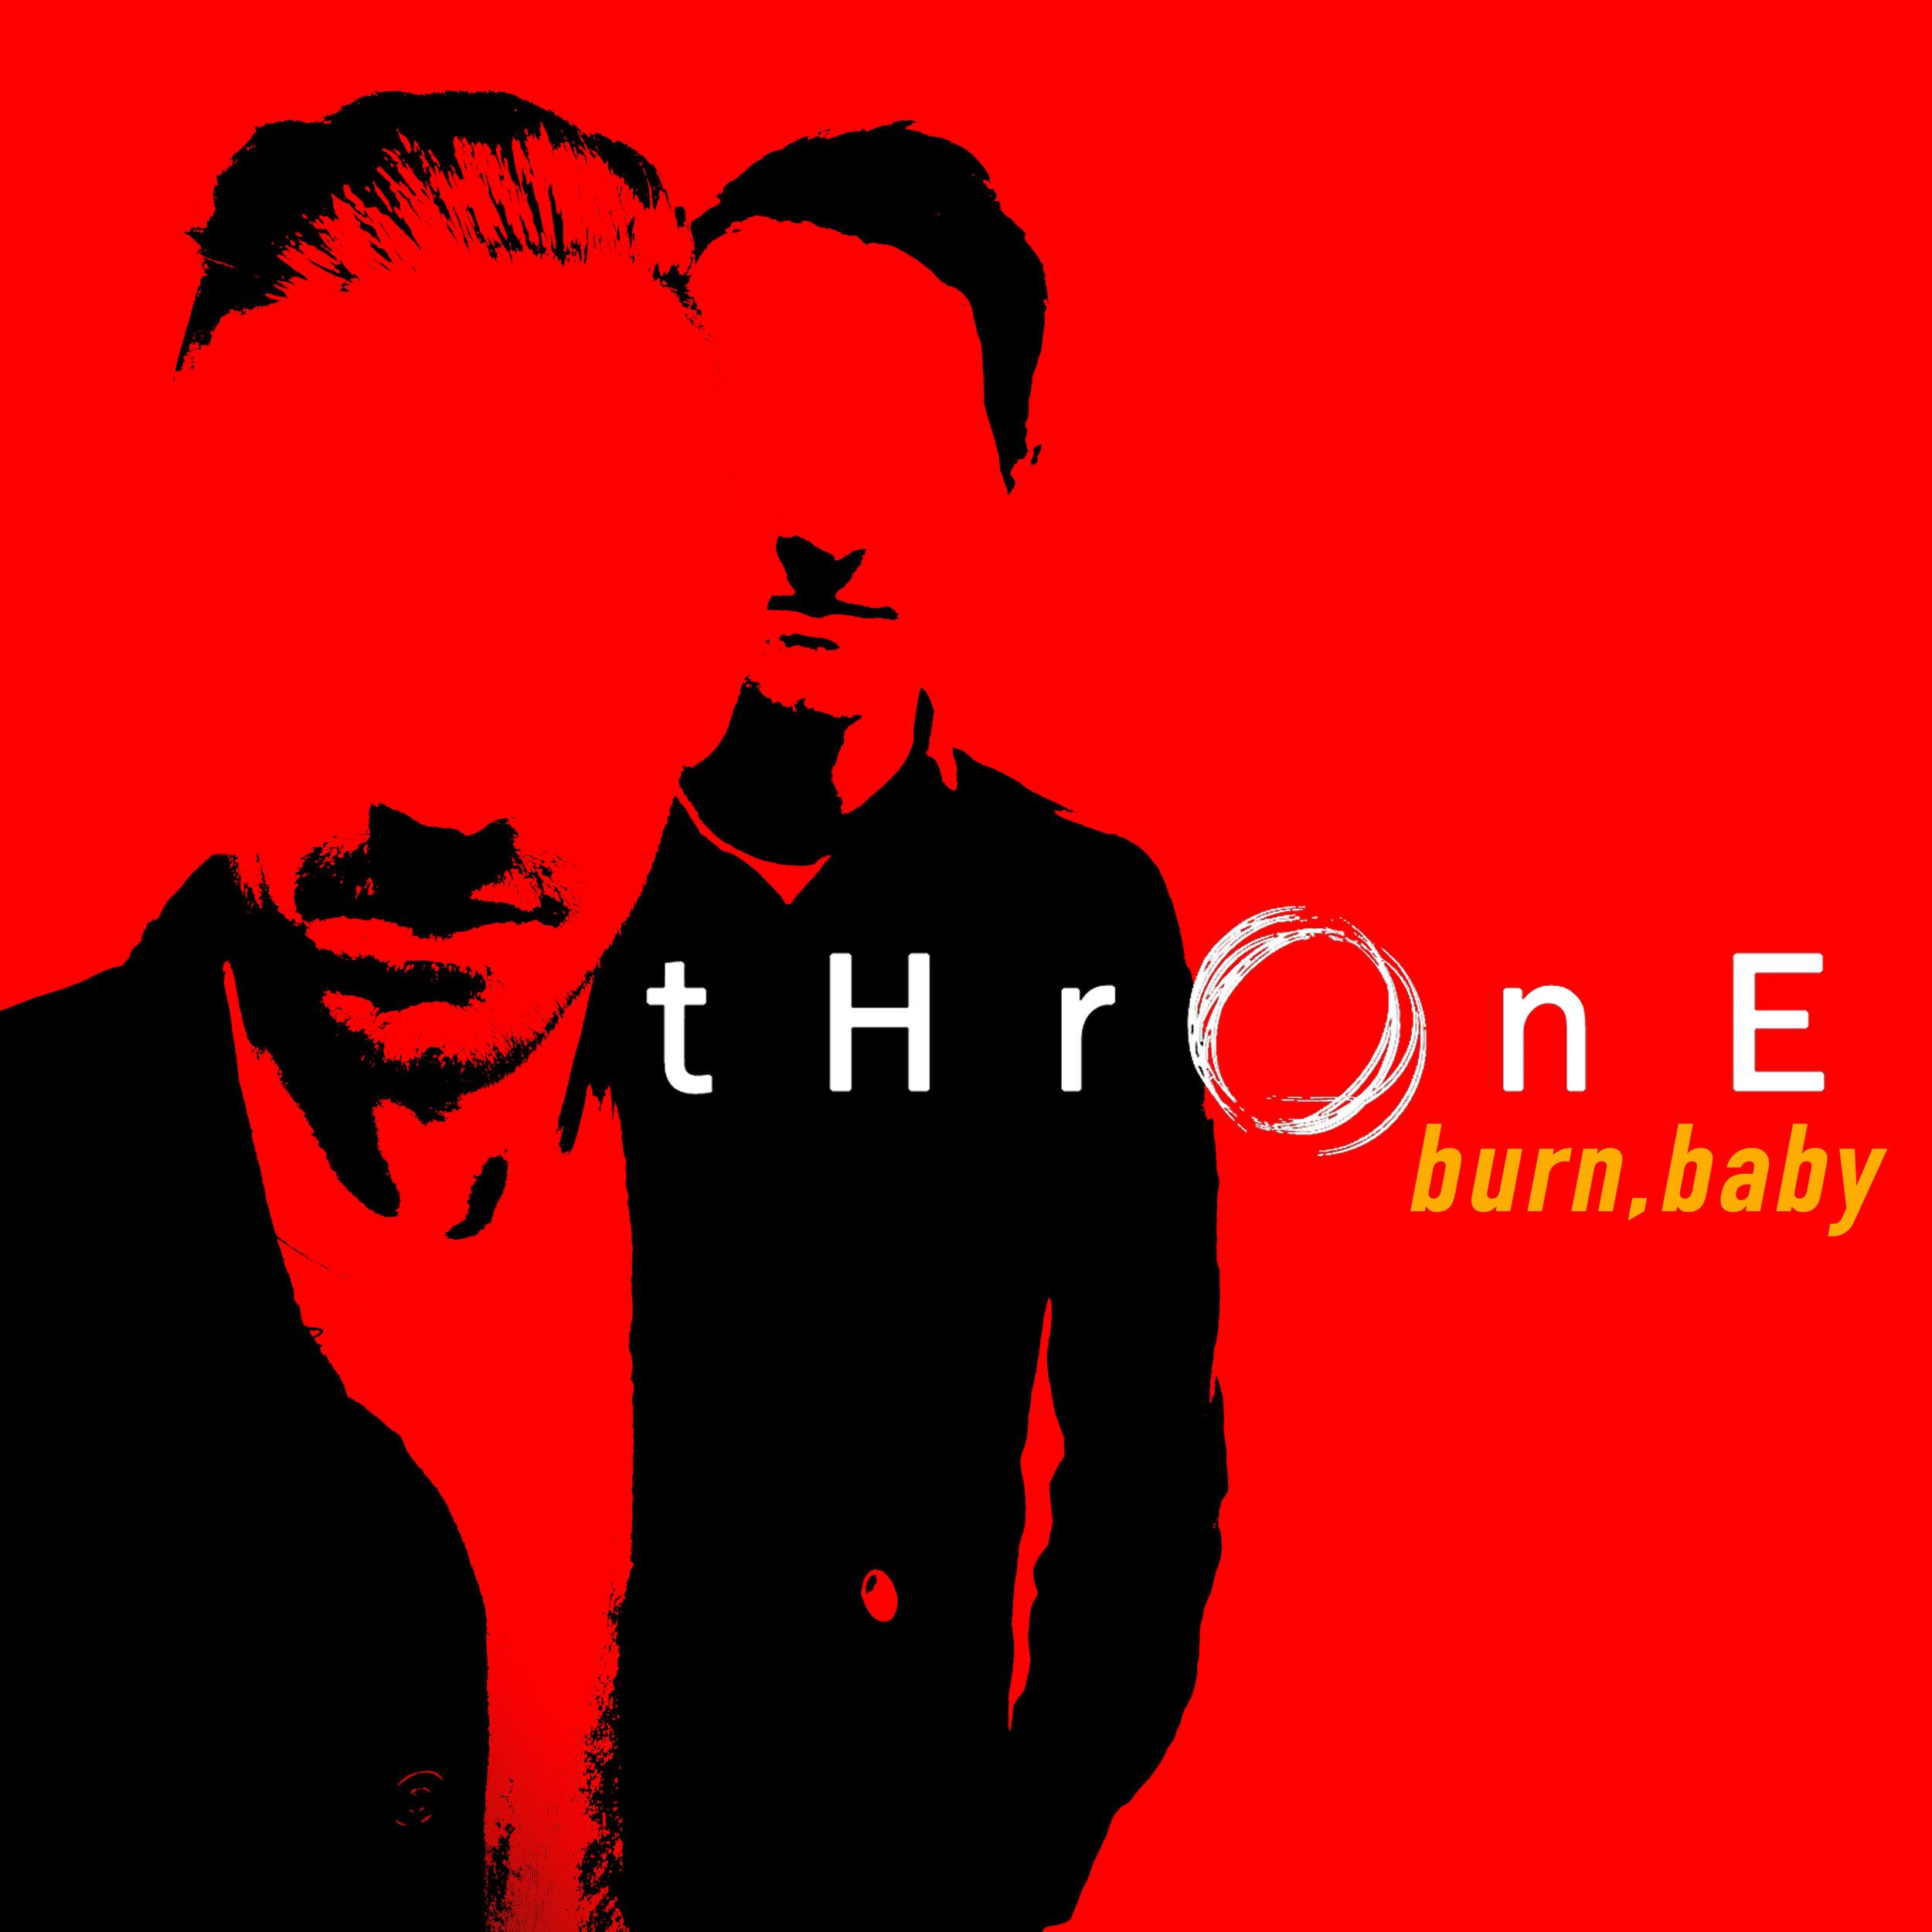 burn,baby (Single - 2017)